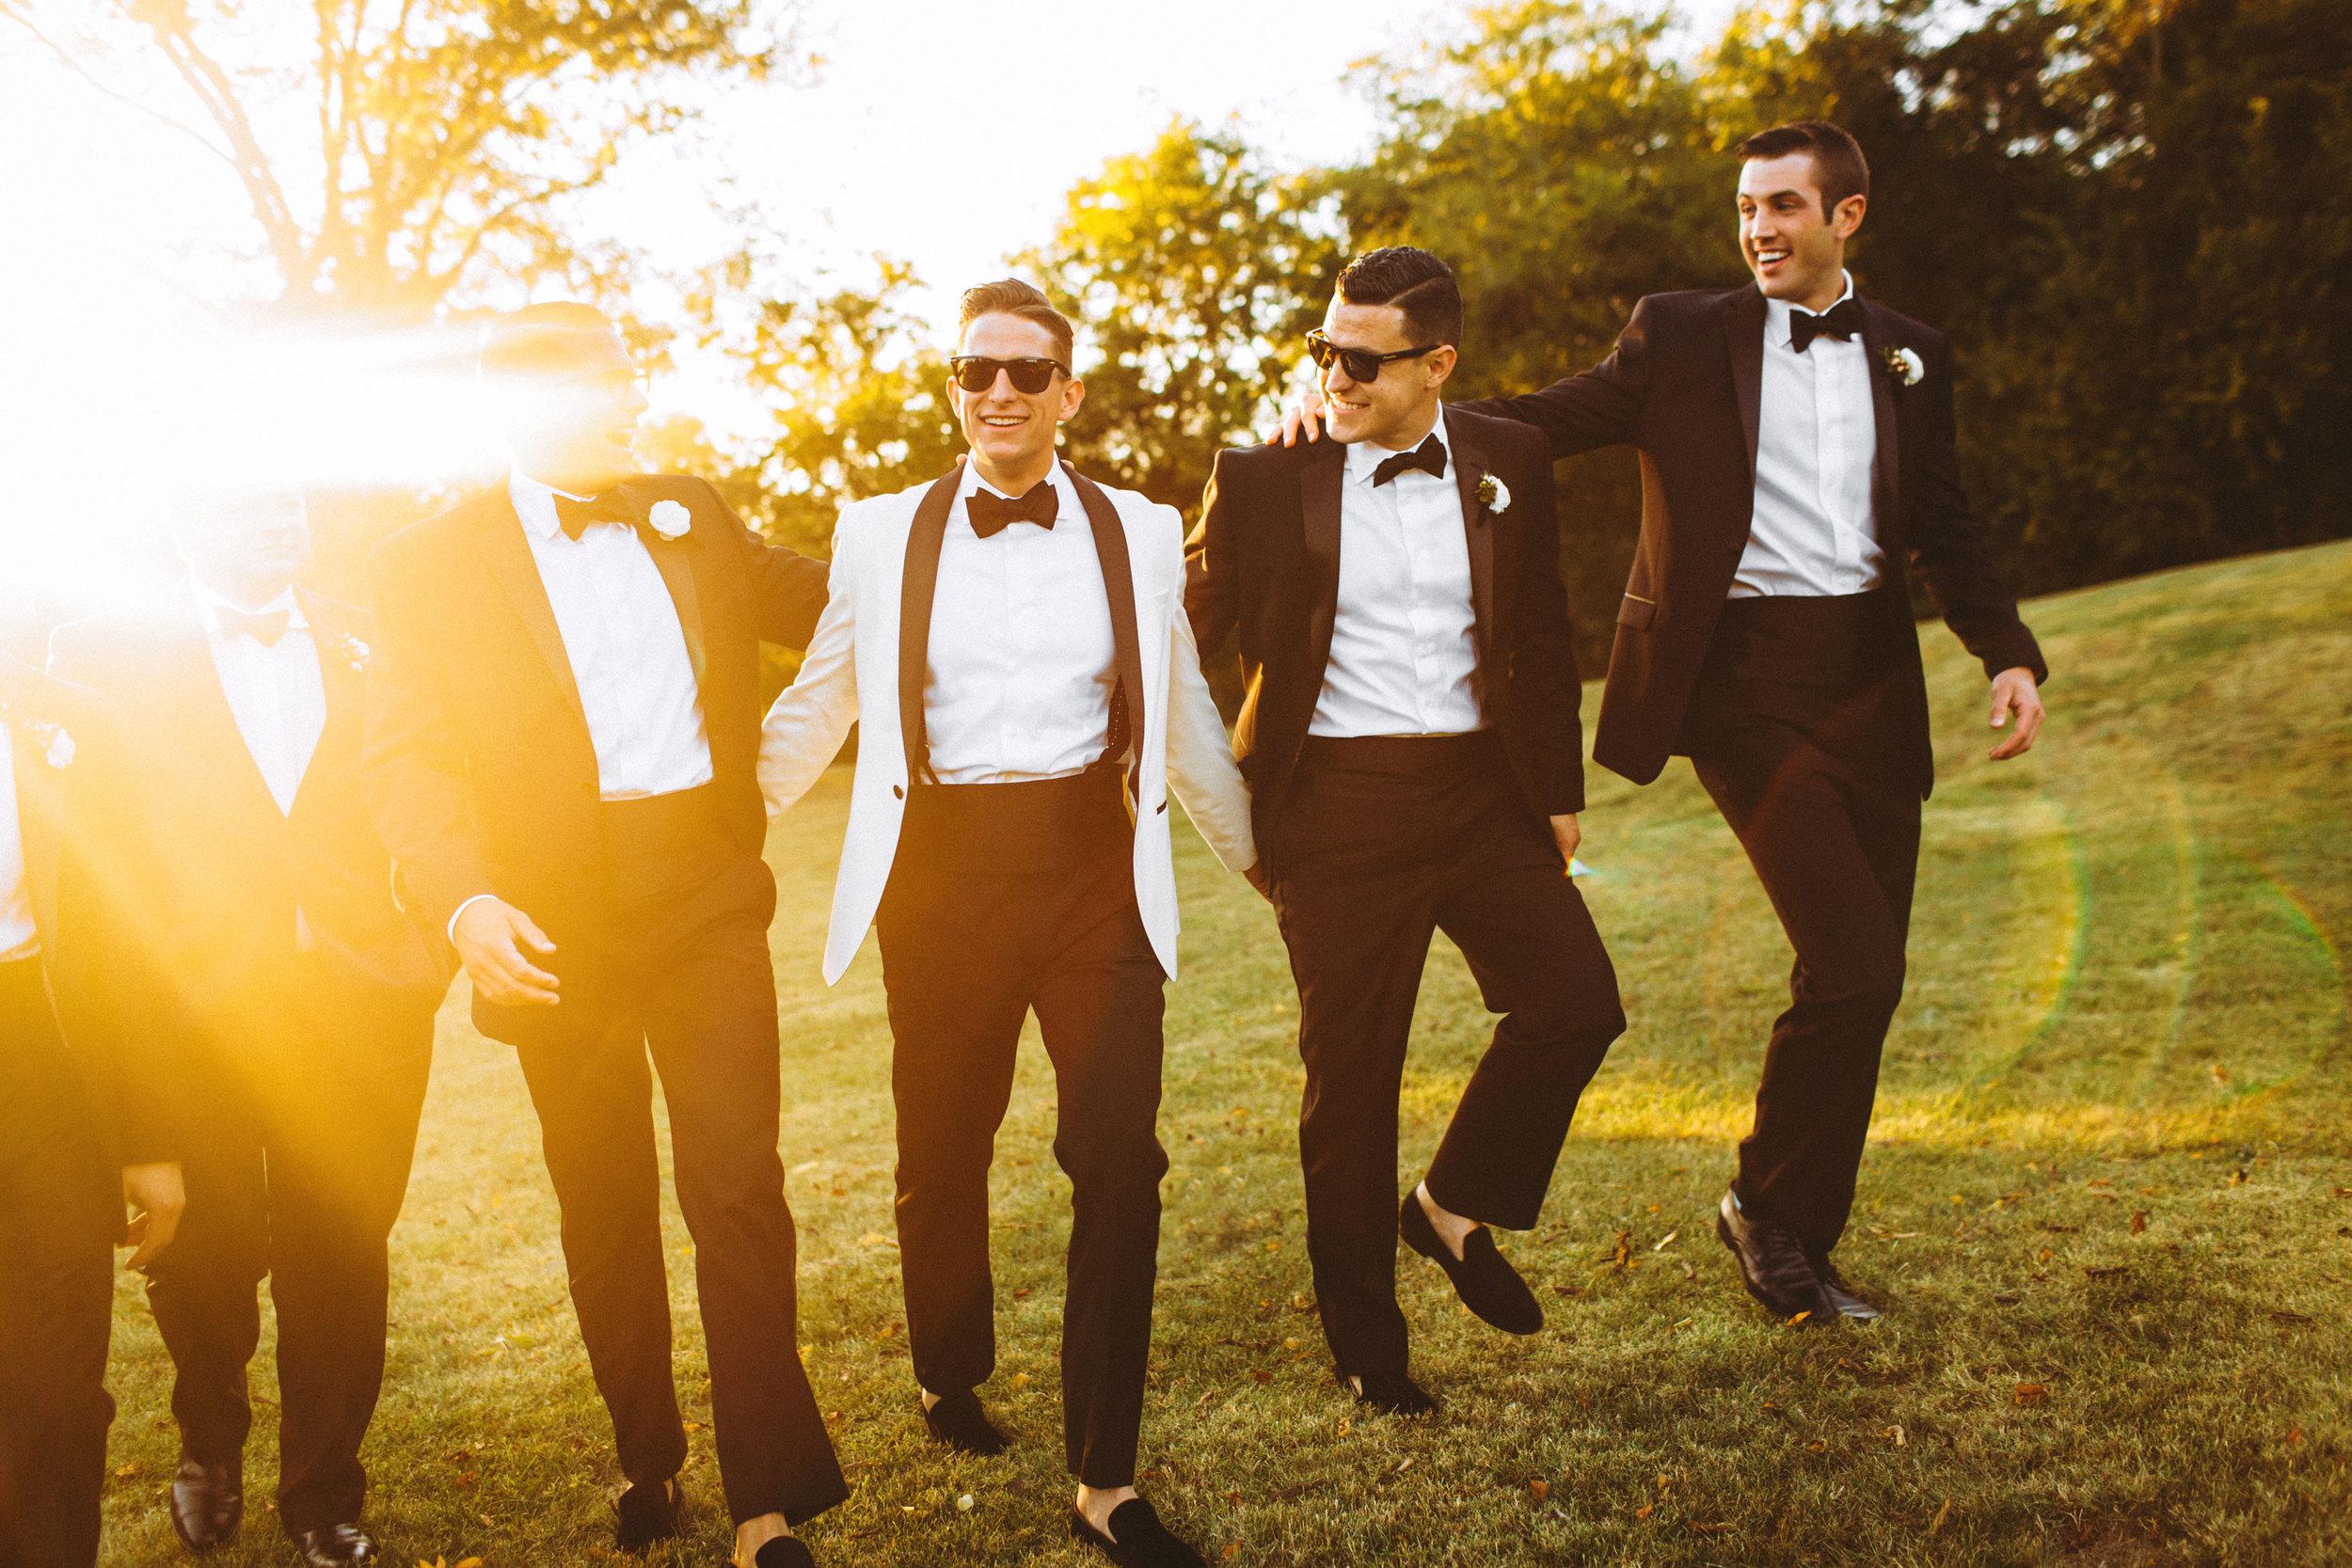 Me & Mr. Jones Wedding, Funny Groomsmen Pictures, Black Tie Wedding, Calvin Klein Slim Fit Black Tuxedos, Groom Wearing White ASOS Tuxedo